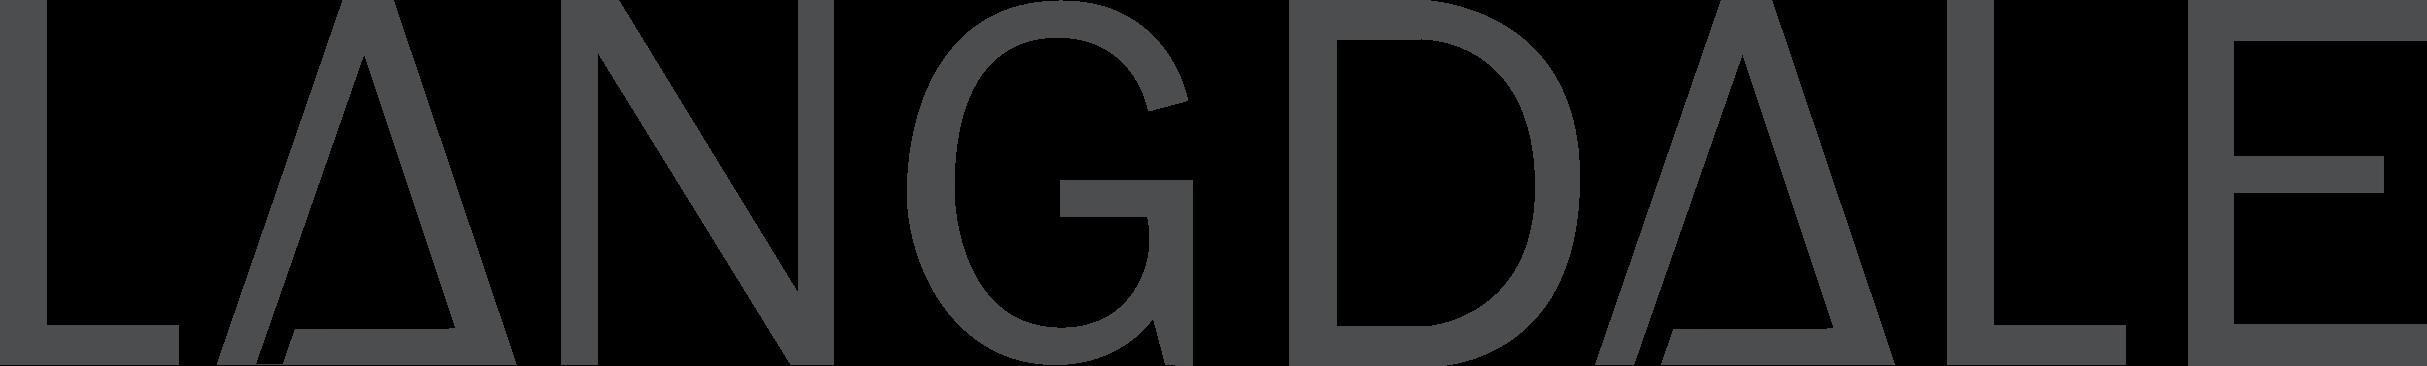 Langdale logo